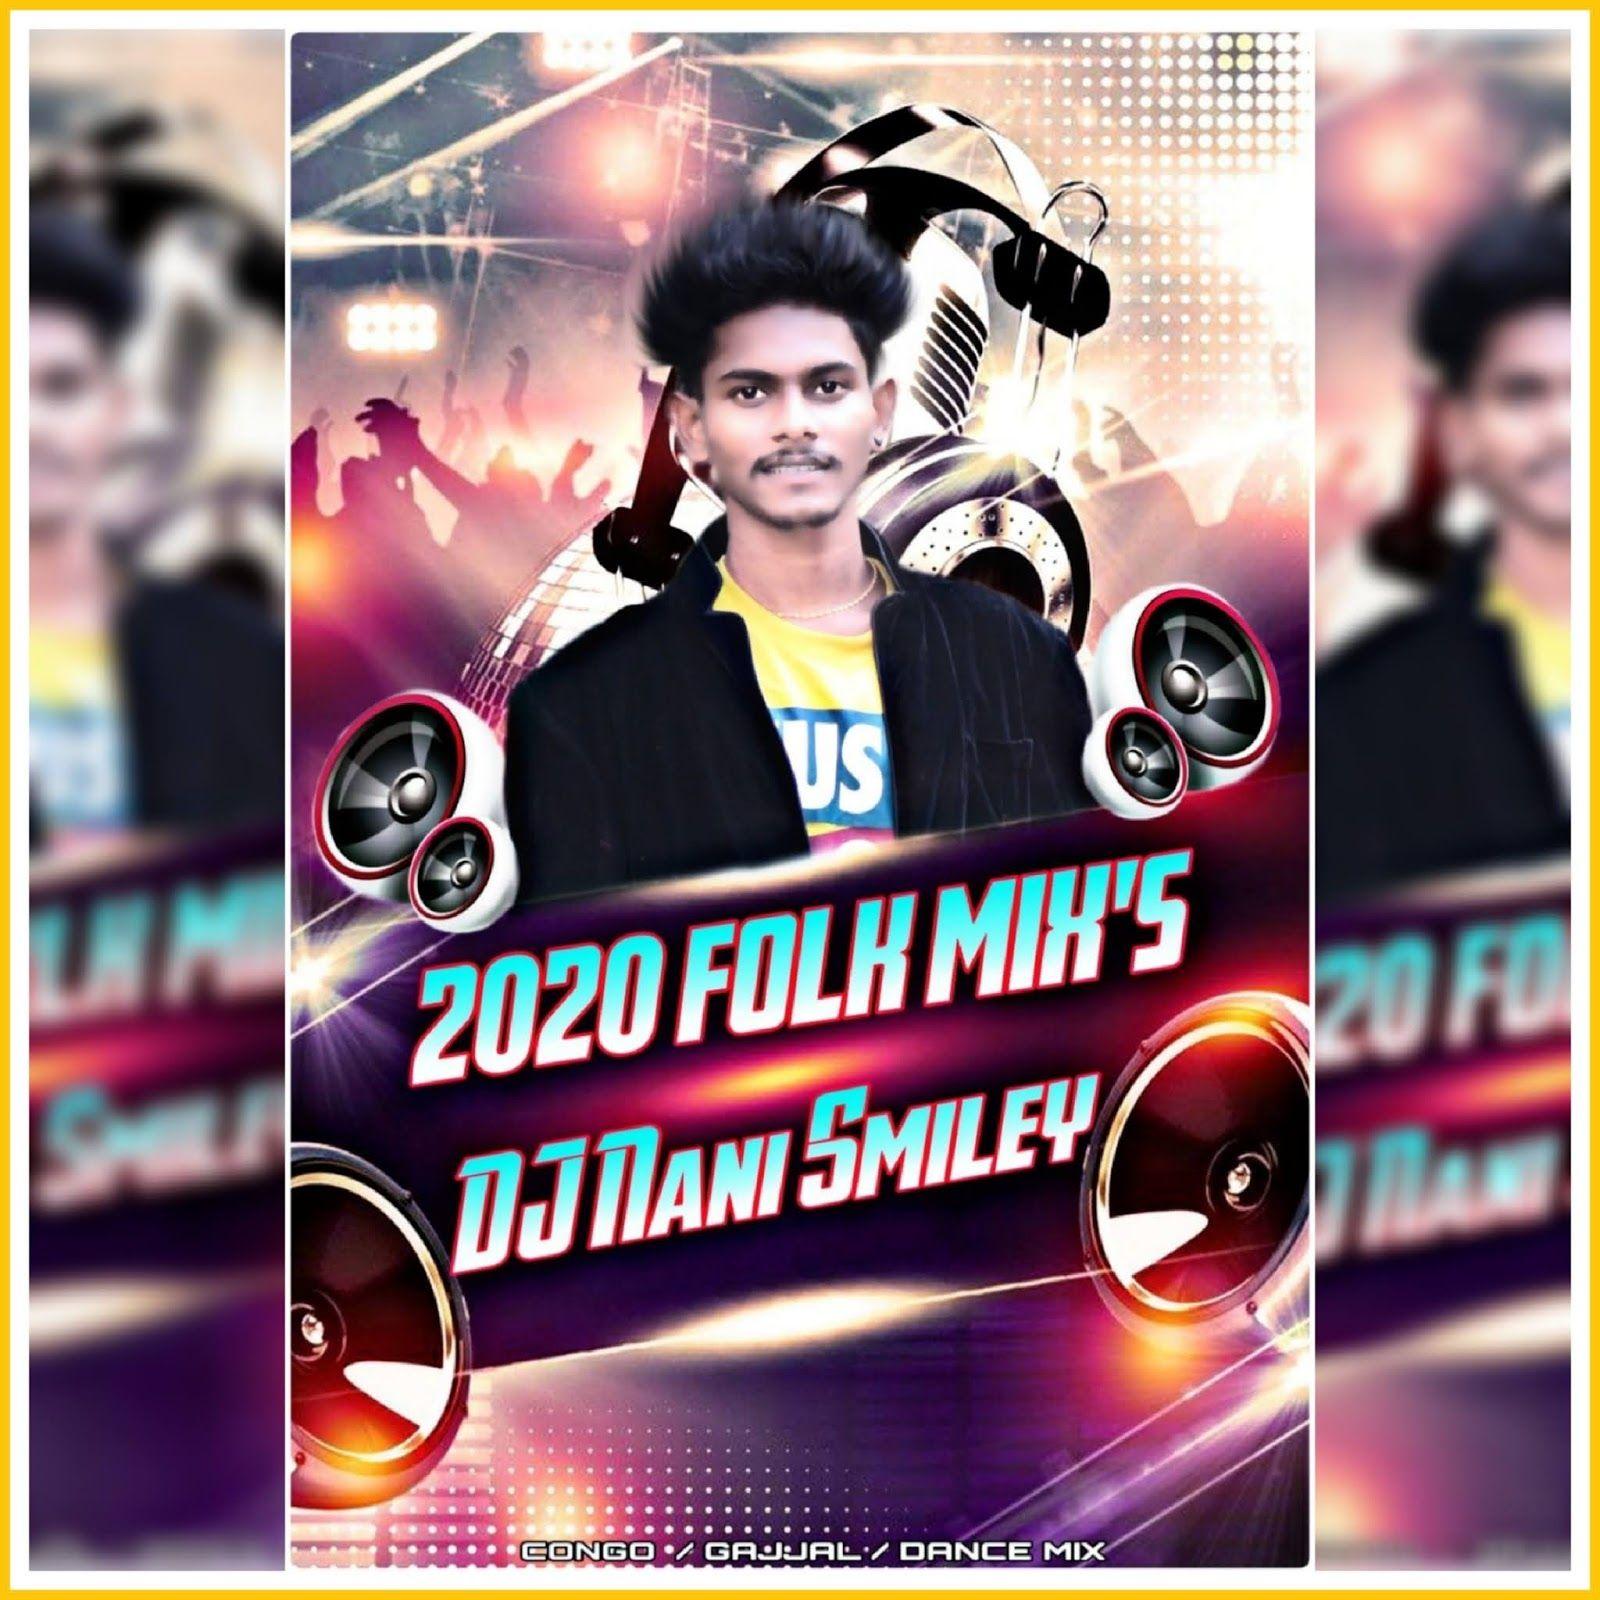 2020 Folk Remixs Dj Nani Smiley Newdjsworld In In 2020 Folk Song Dj Remix Songs Dj Songs List